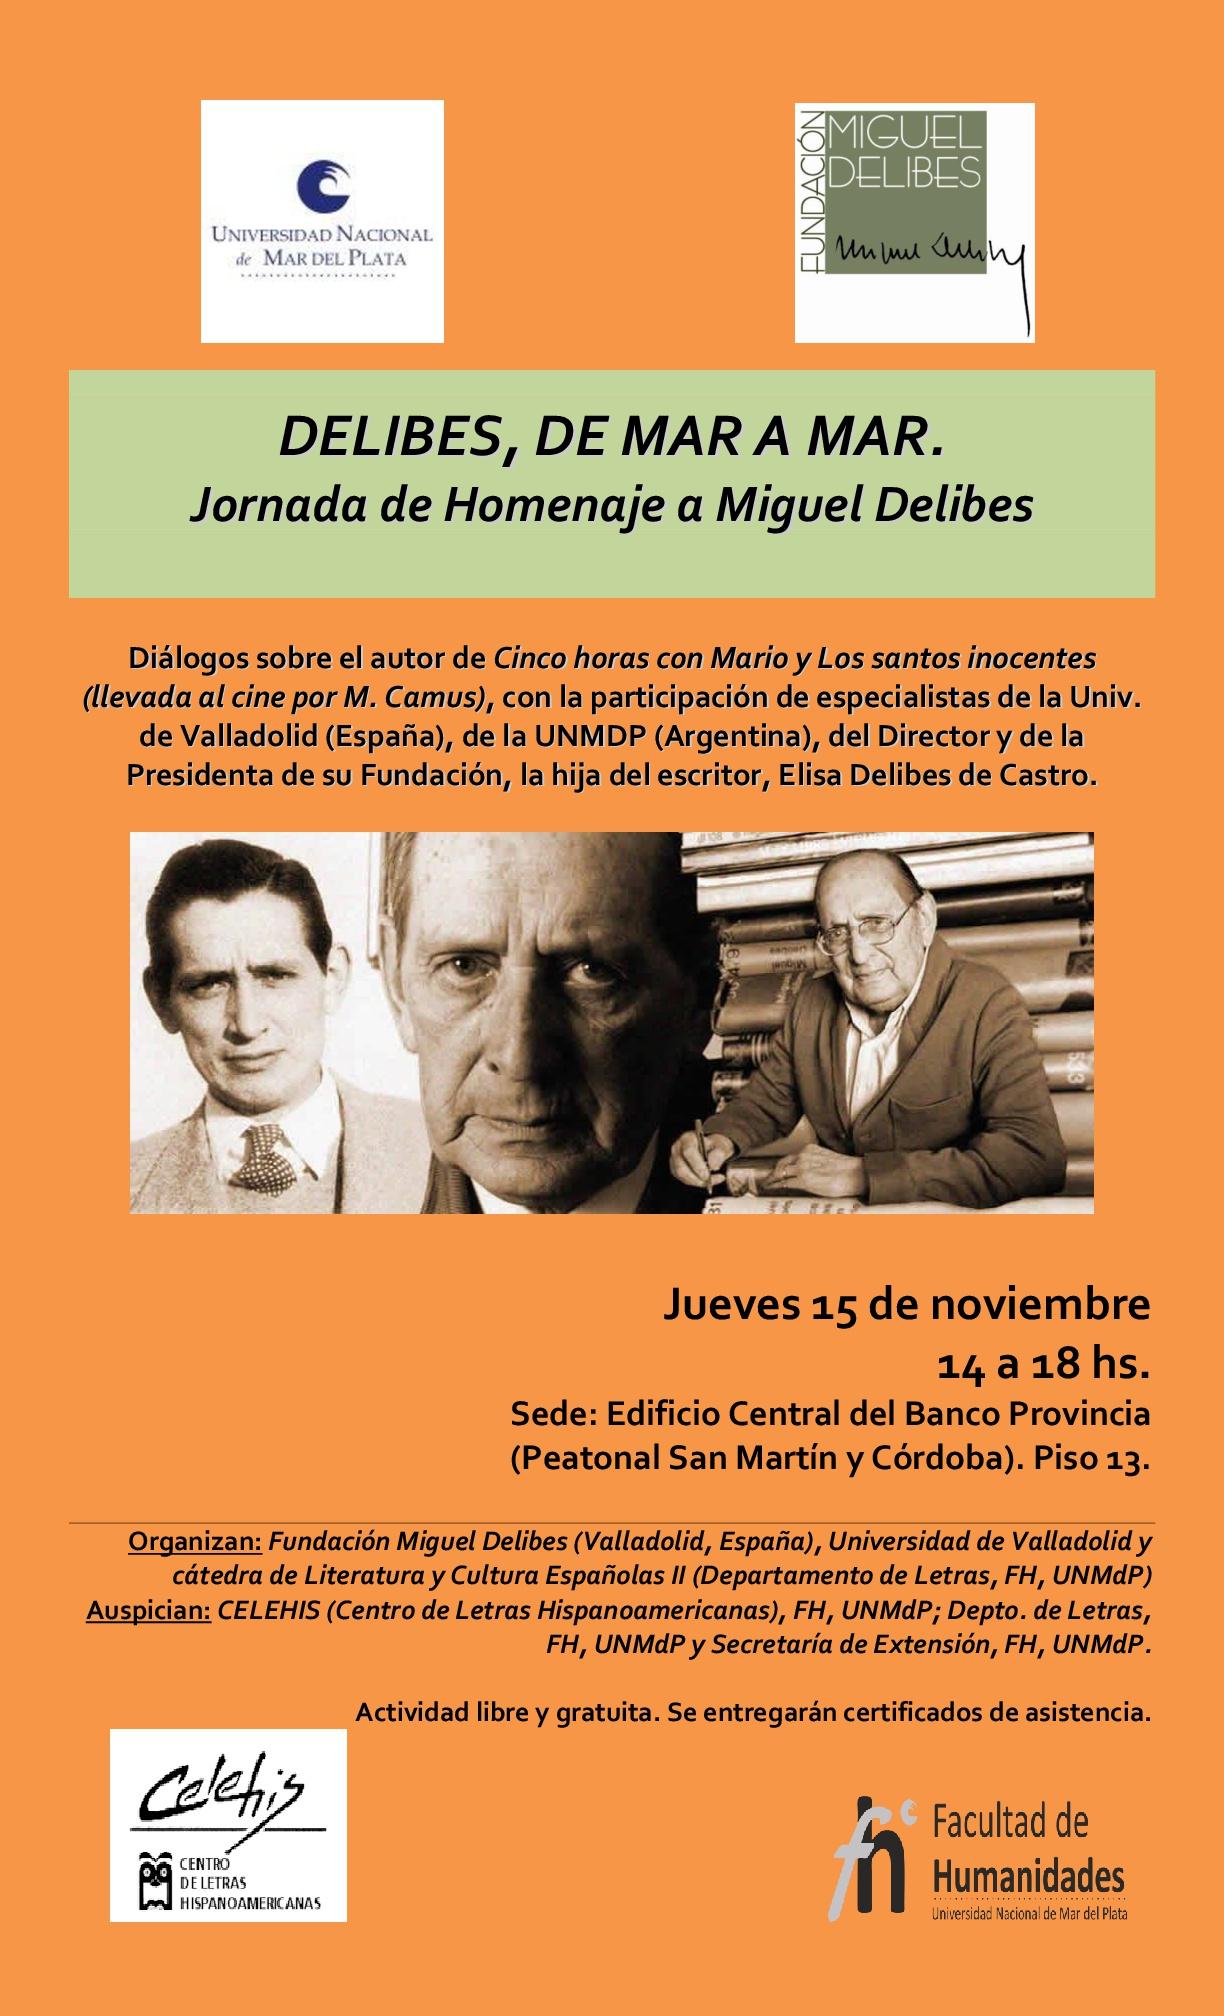 Jornada homenaje a Miguel Delibes en Argentina